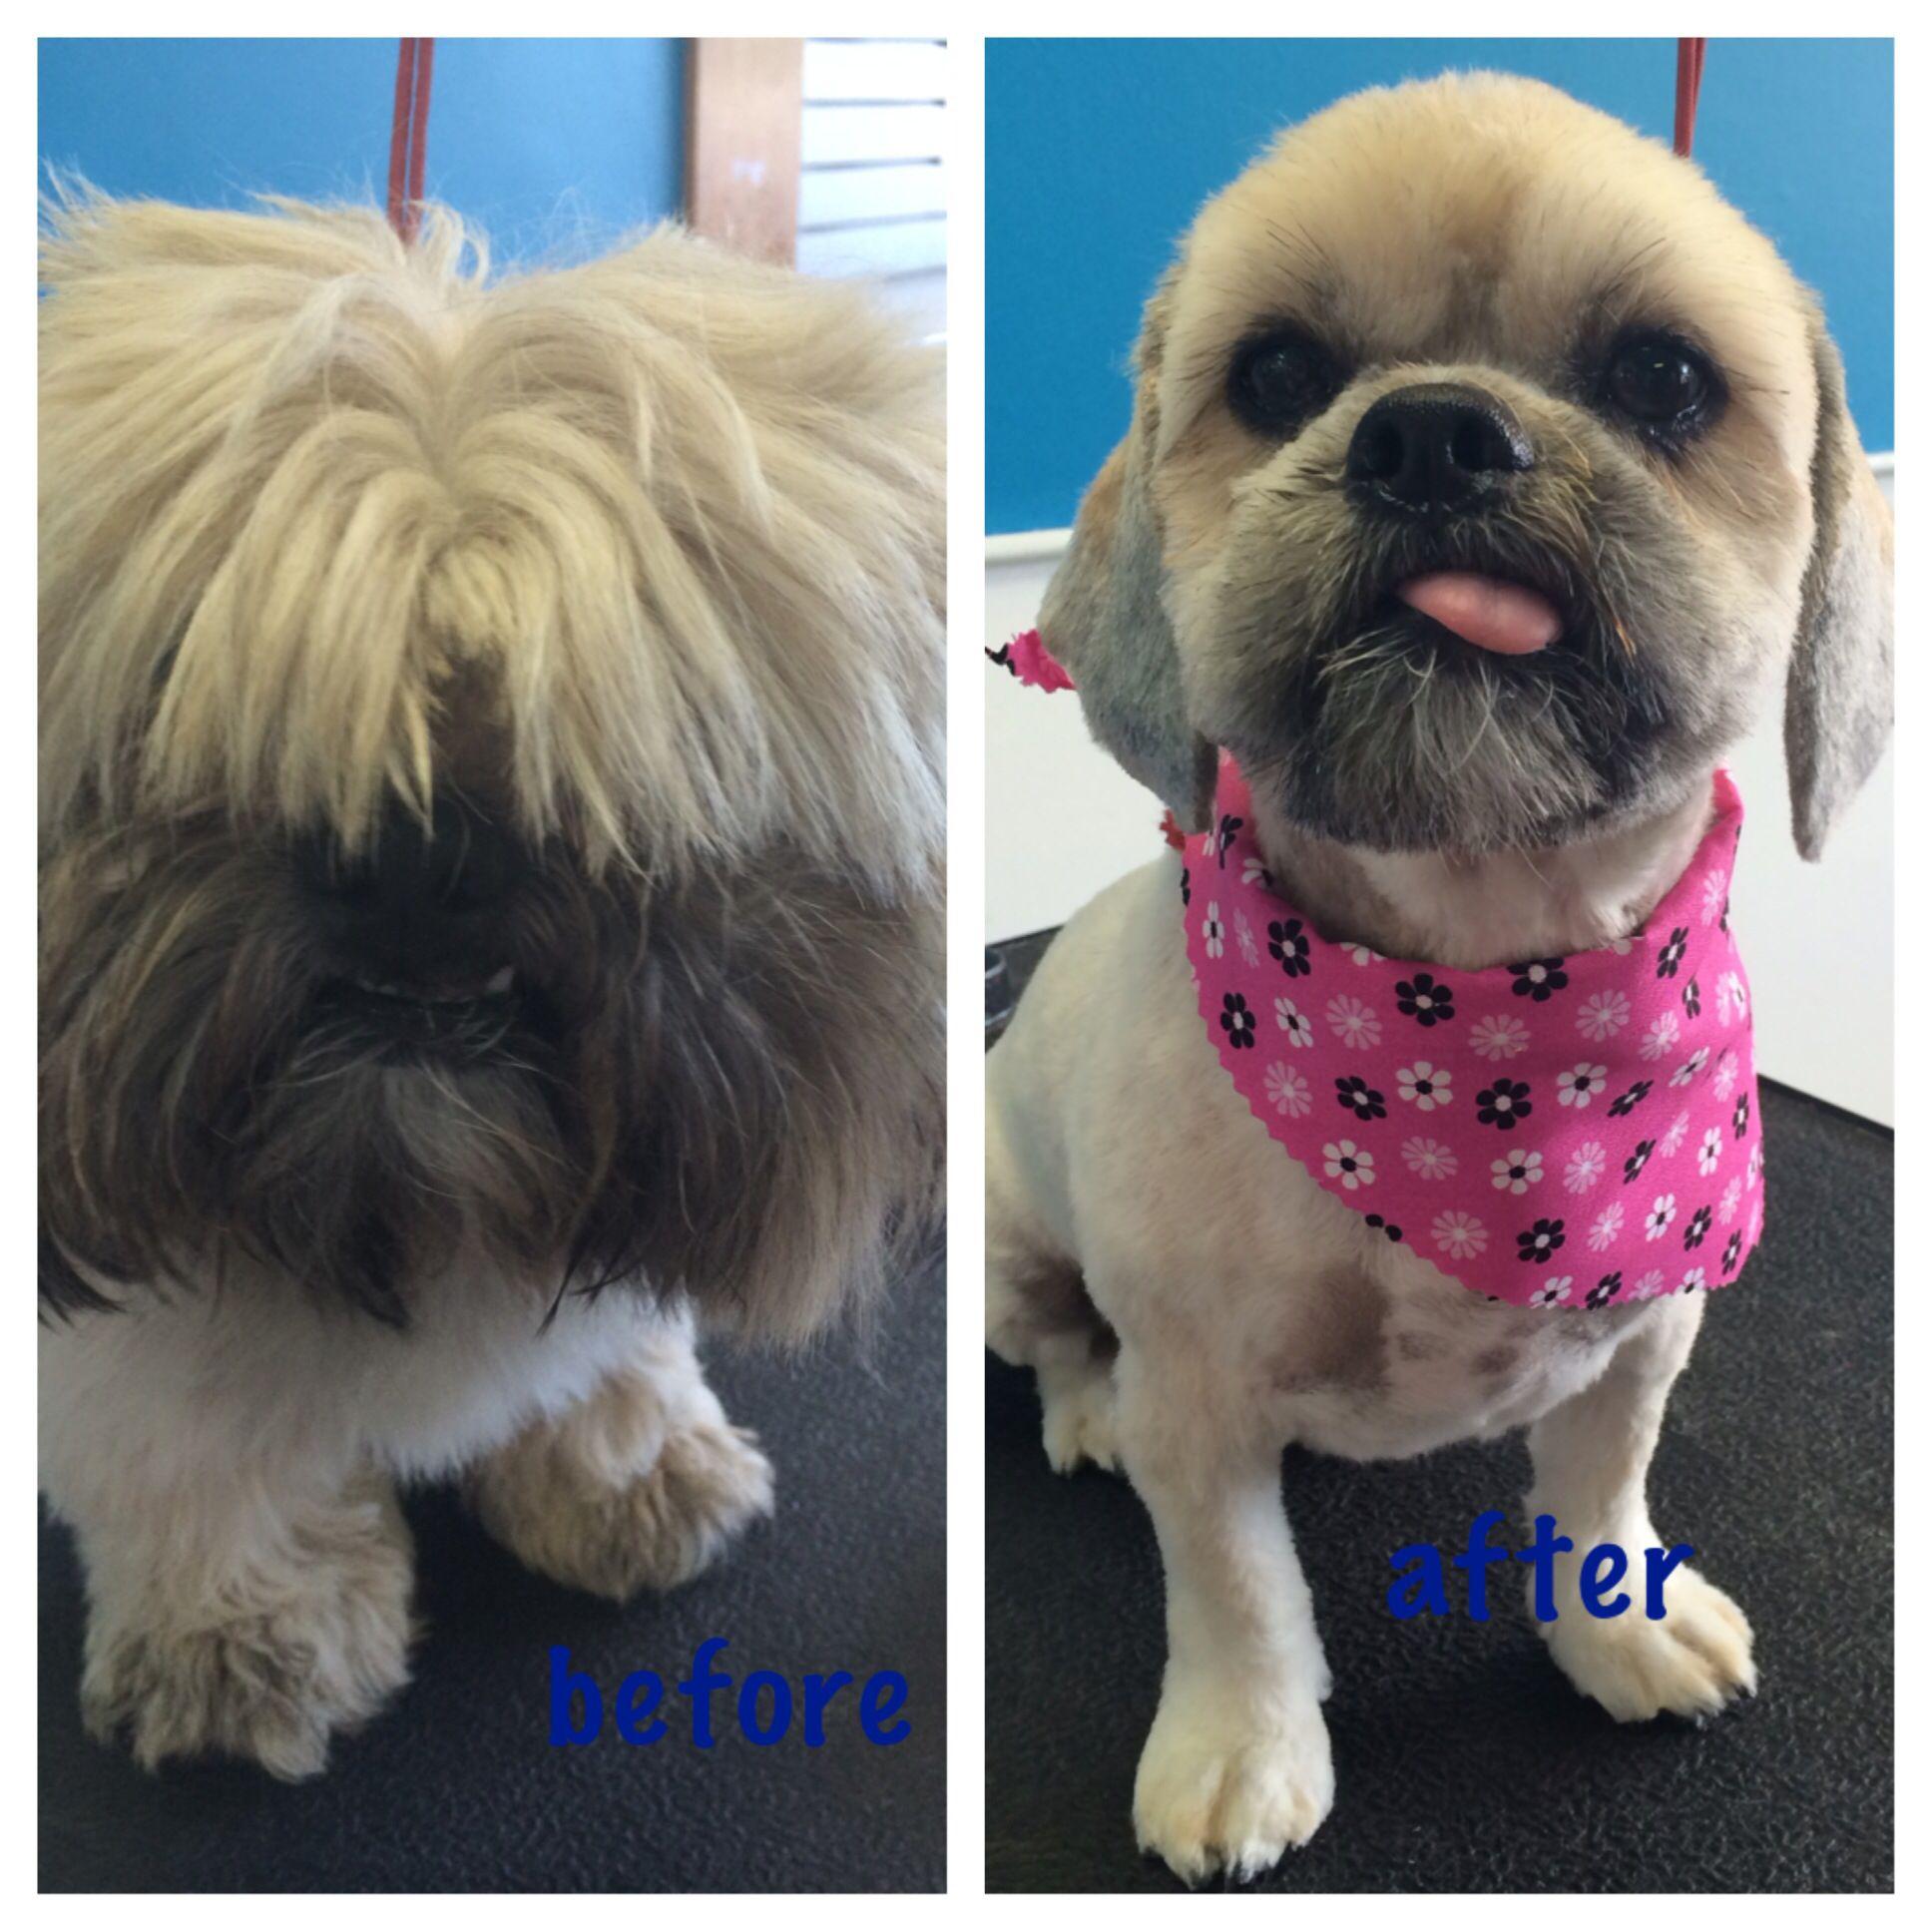 Pampered pets salon llc Pamper pets, Pets, Pet salon